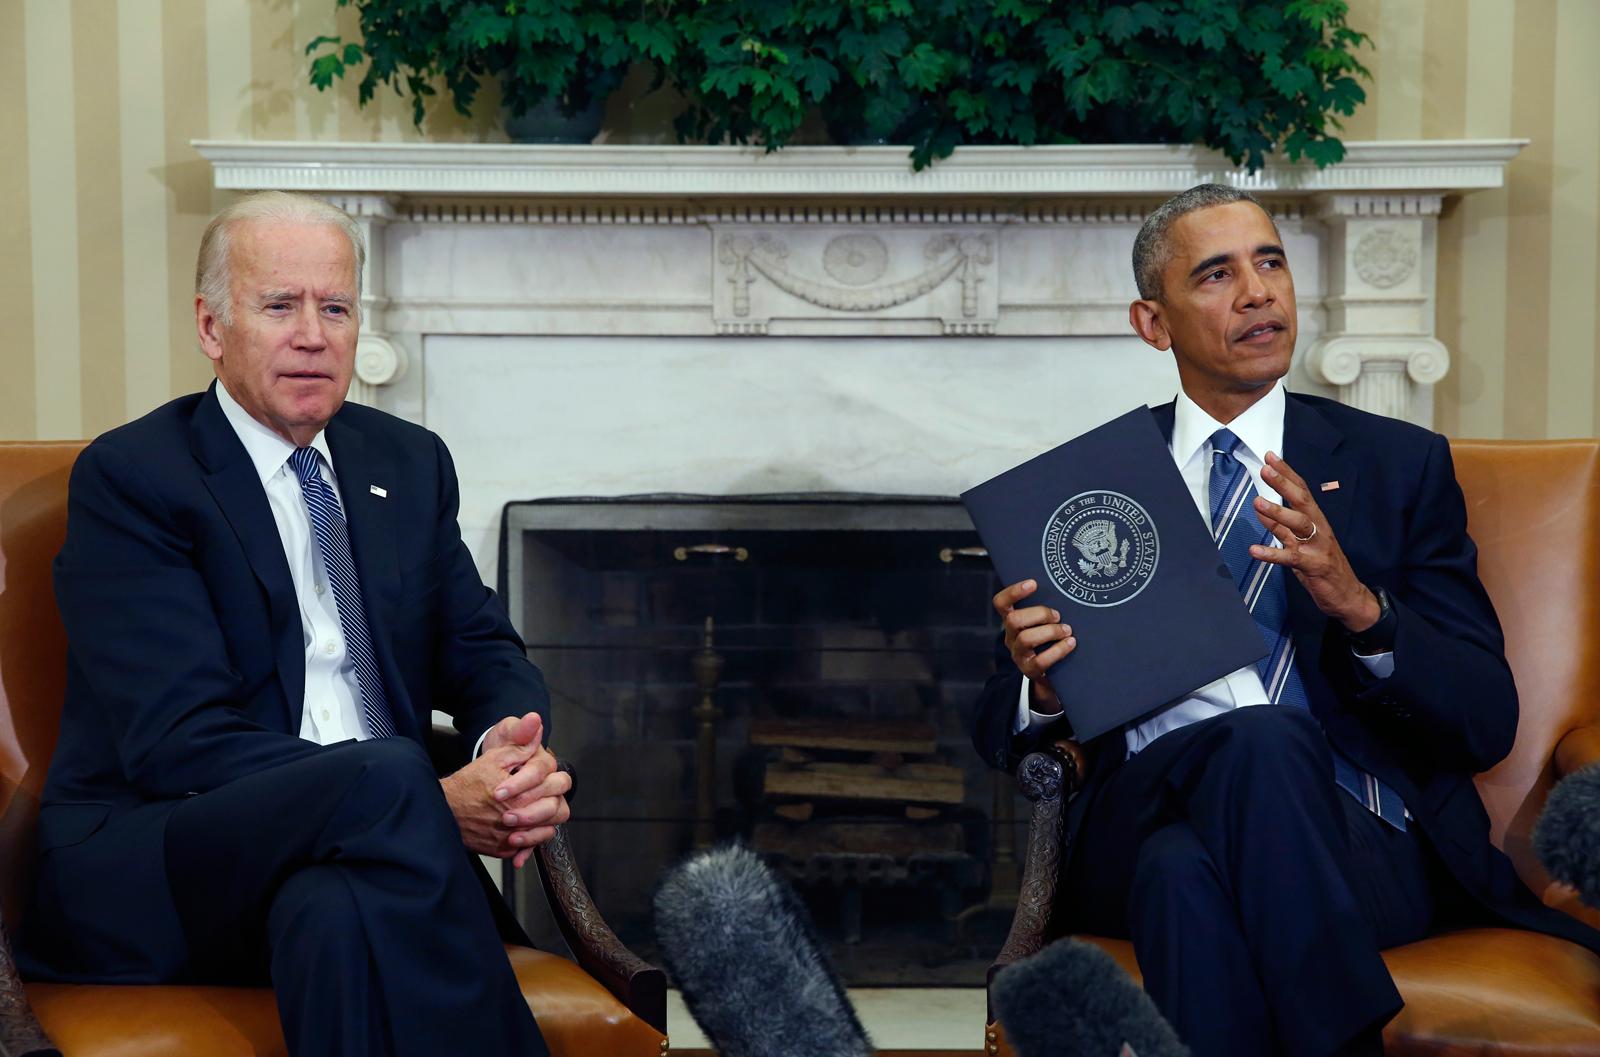 Joe Biden and Barack Obama discuss the Cancer Moonshot Report.